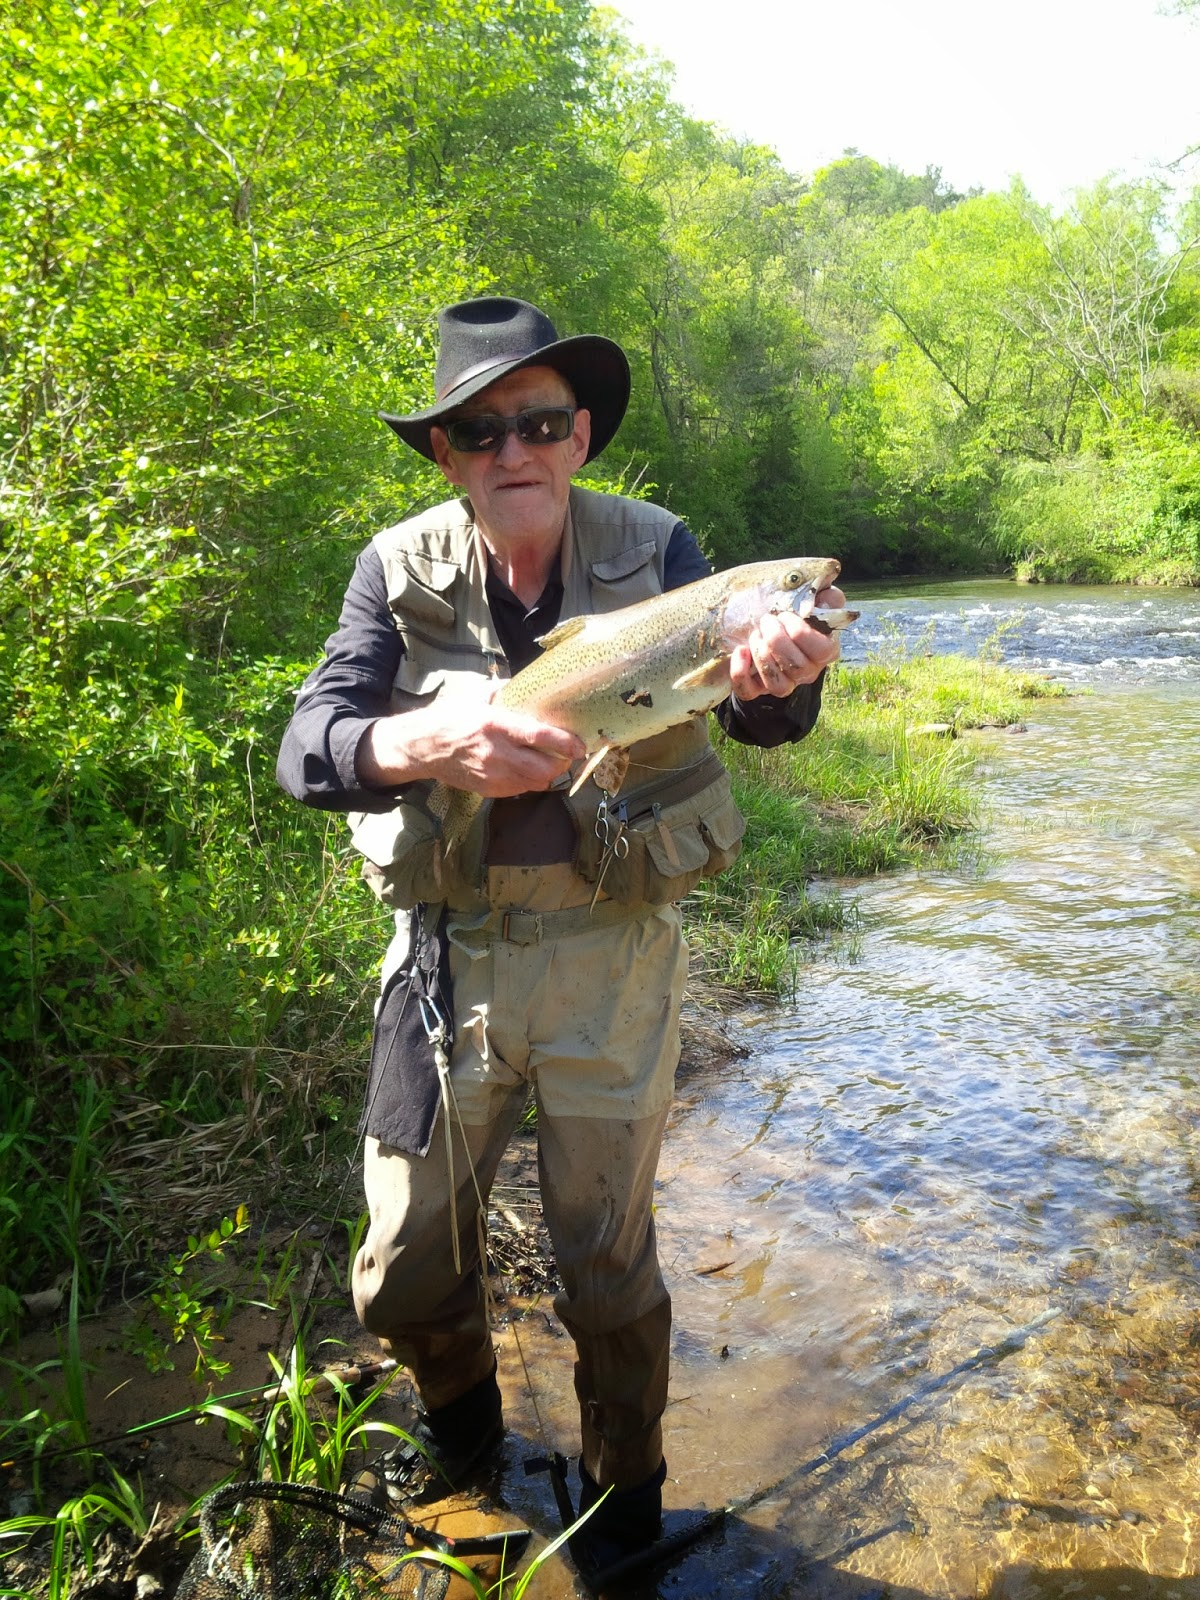 GA FOOTHILLS - 629: FISHING OUTING SCHEDULE--2018